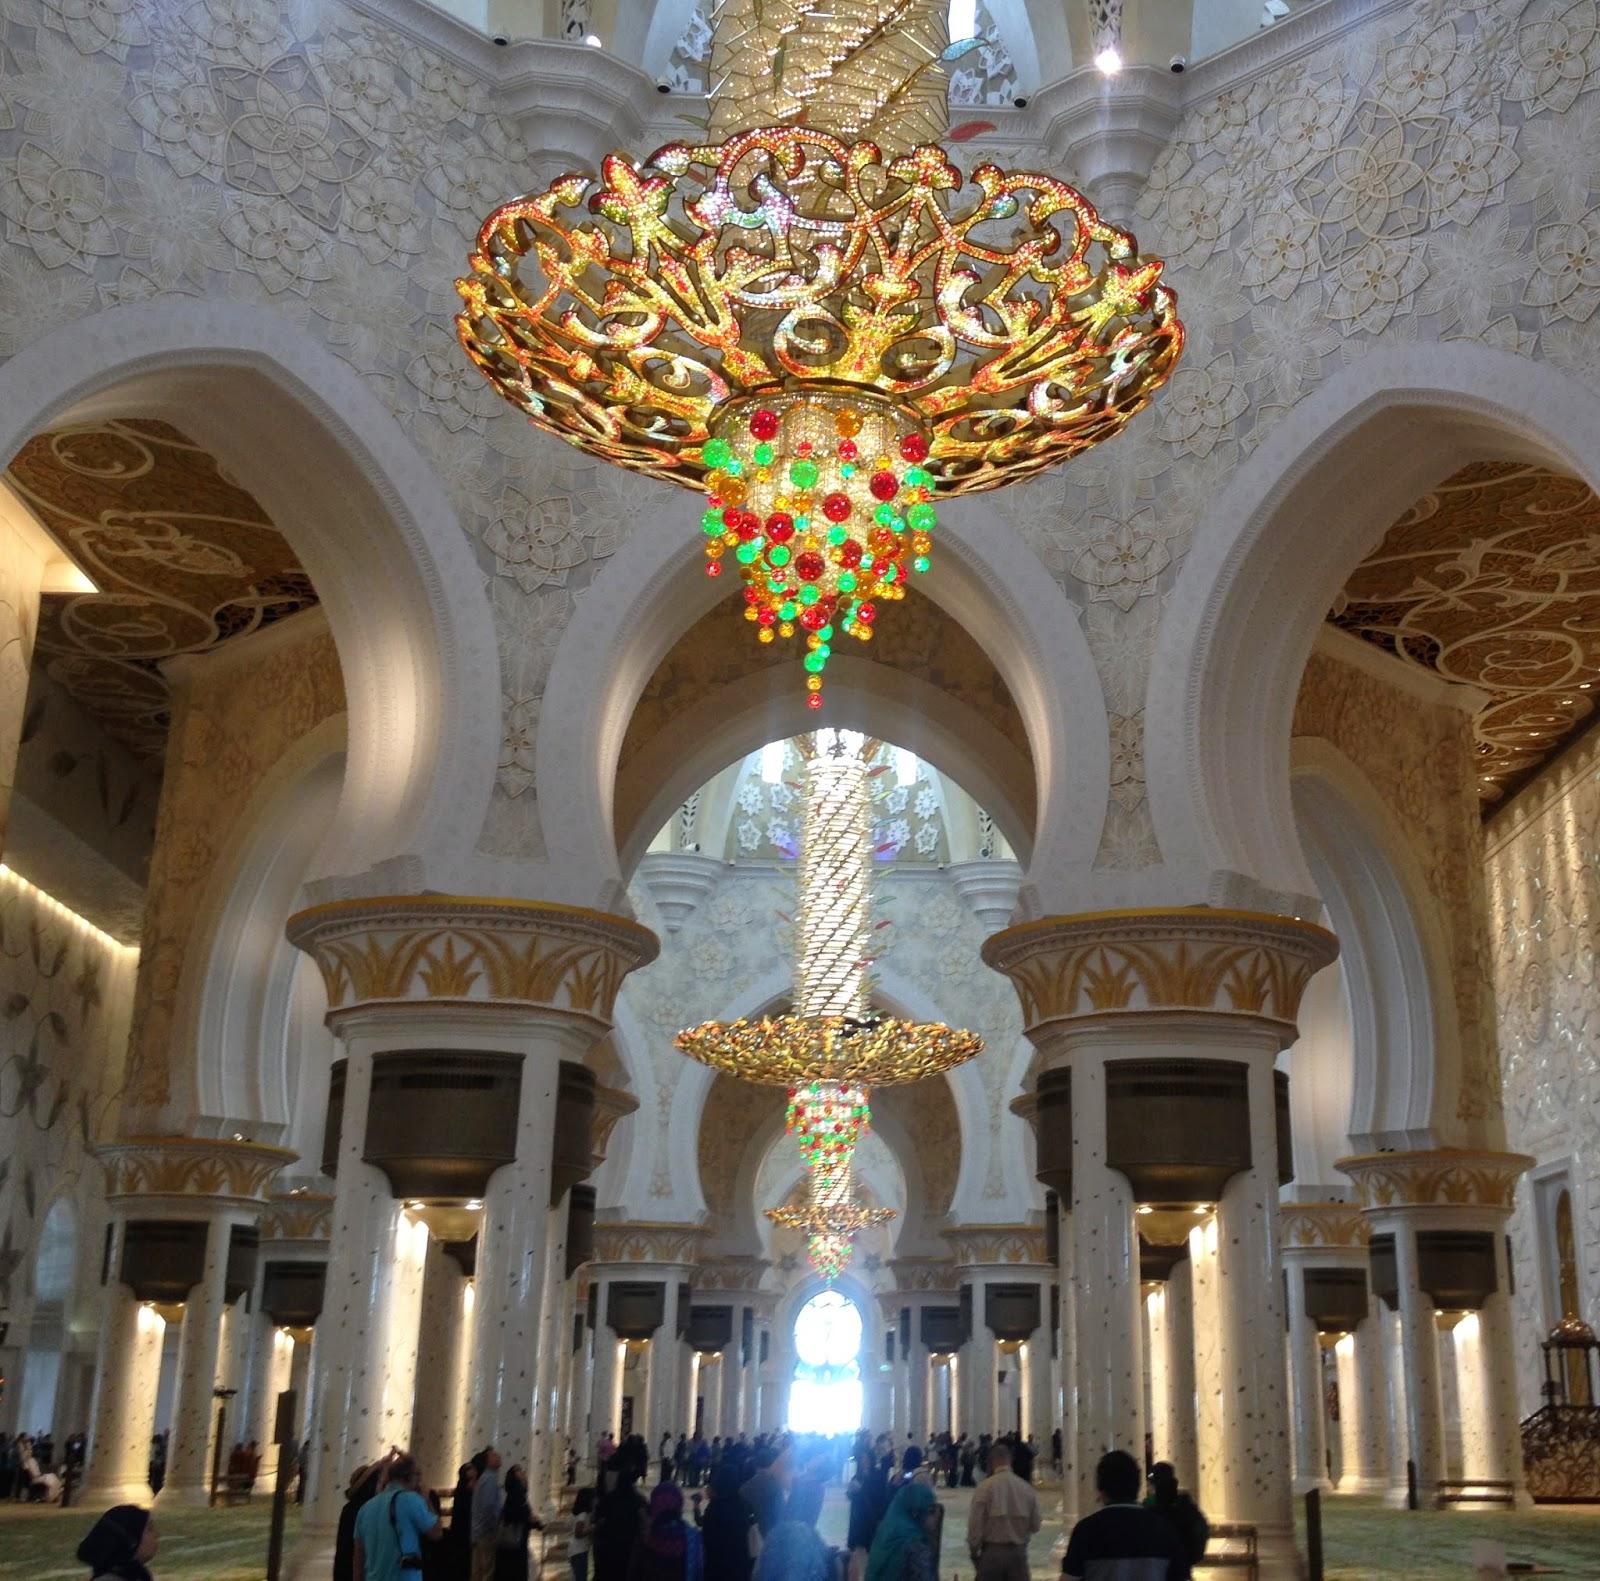 La frome chez les duba otes grande mosqu e sheikh zayed abu dhabi for Grande horloge murale solde